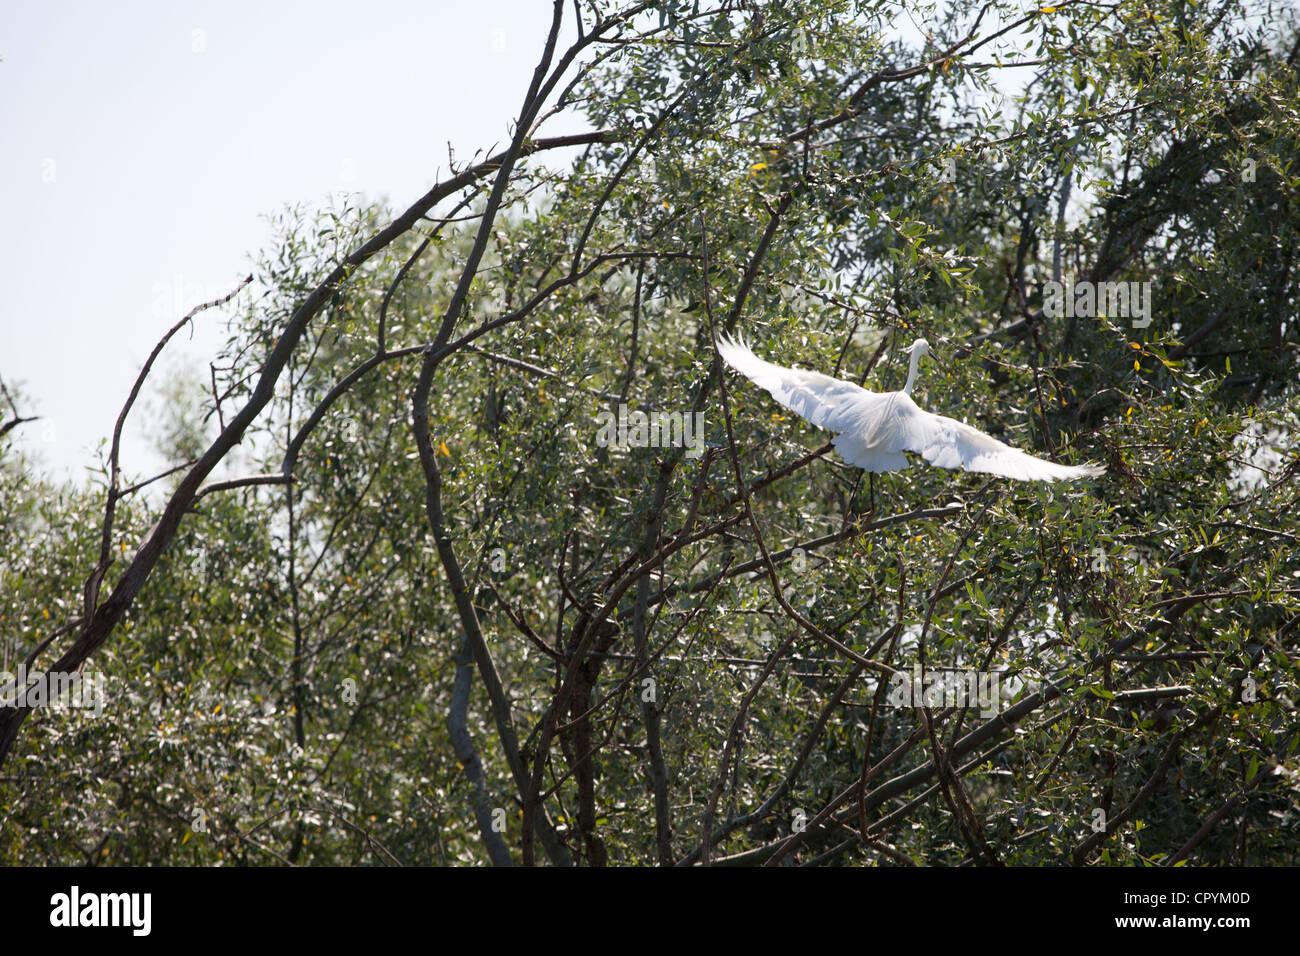 erodios,lake Kerkini,Greece,bird,ecosystem,nest,nature - Stock Image